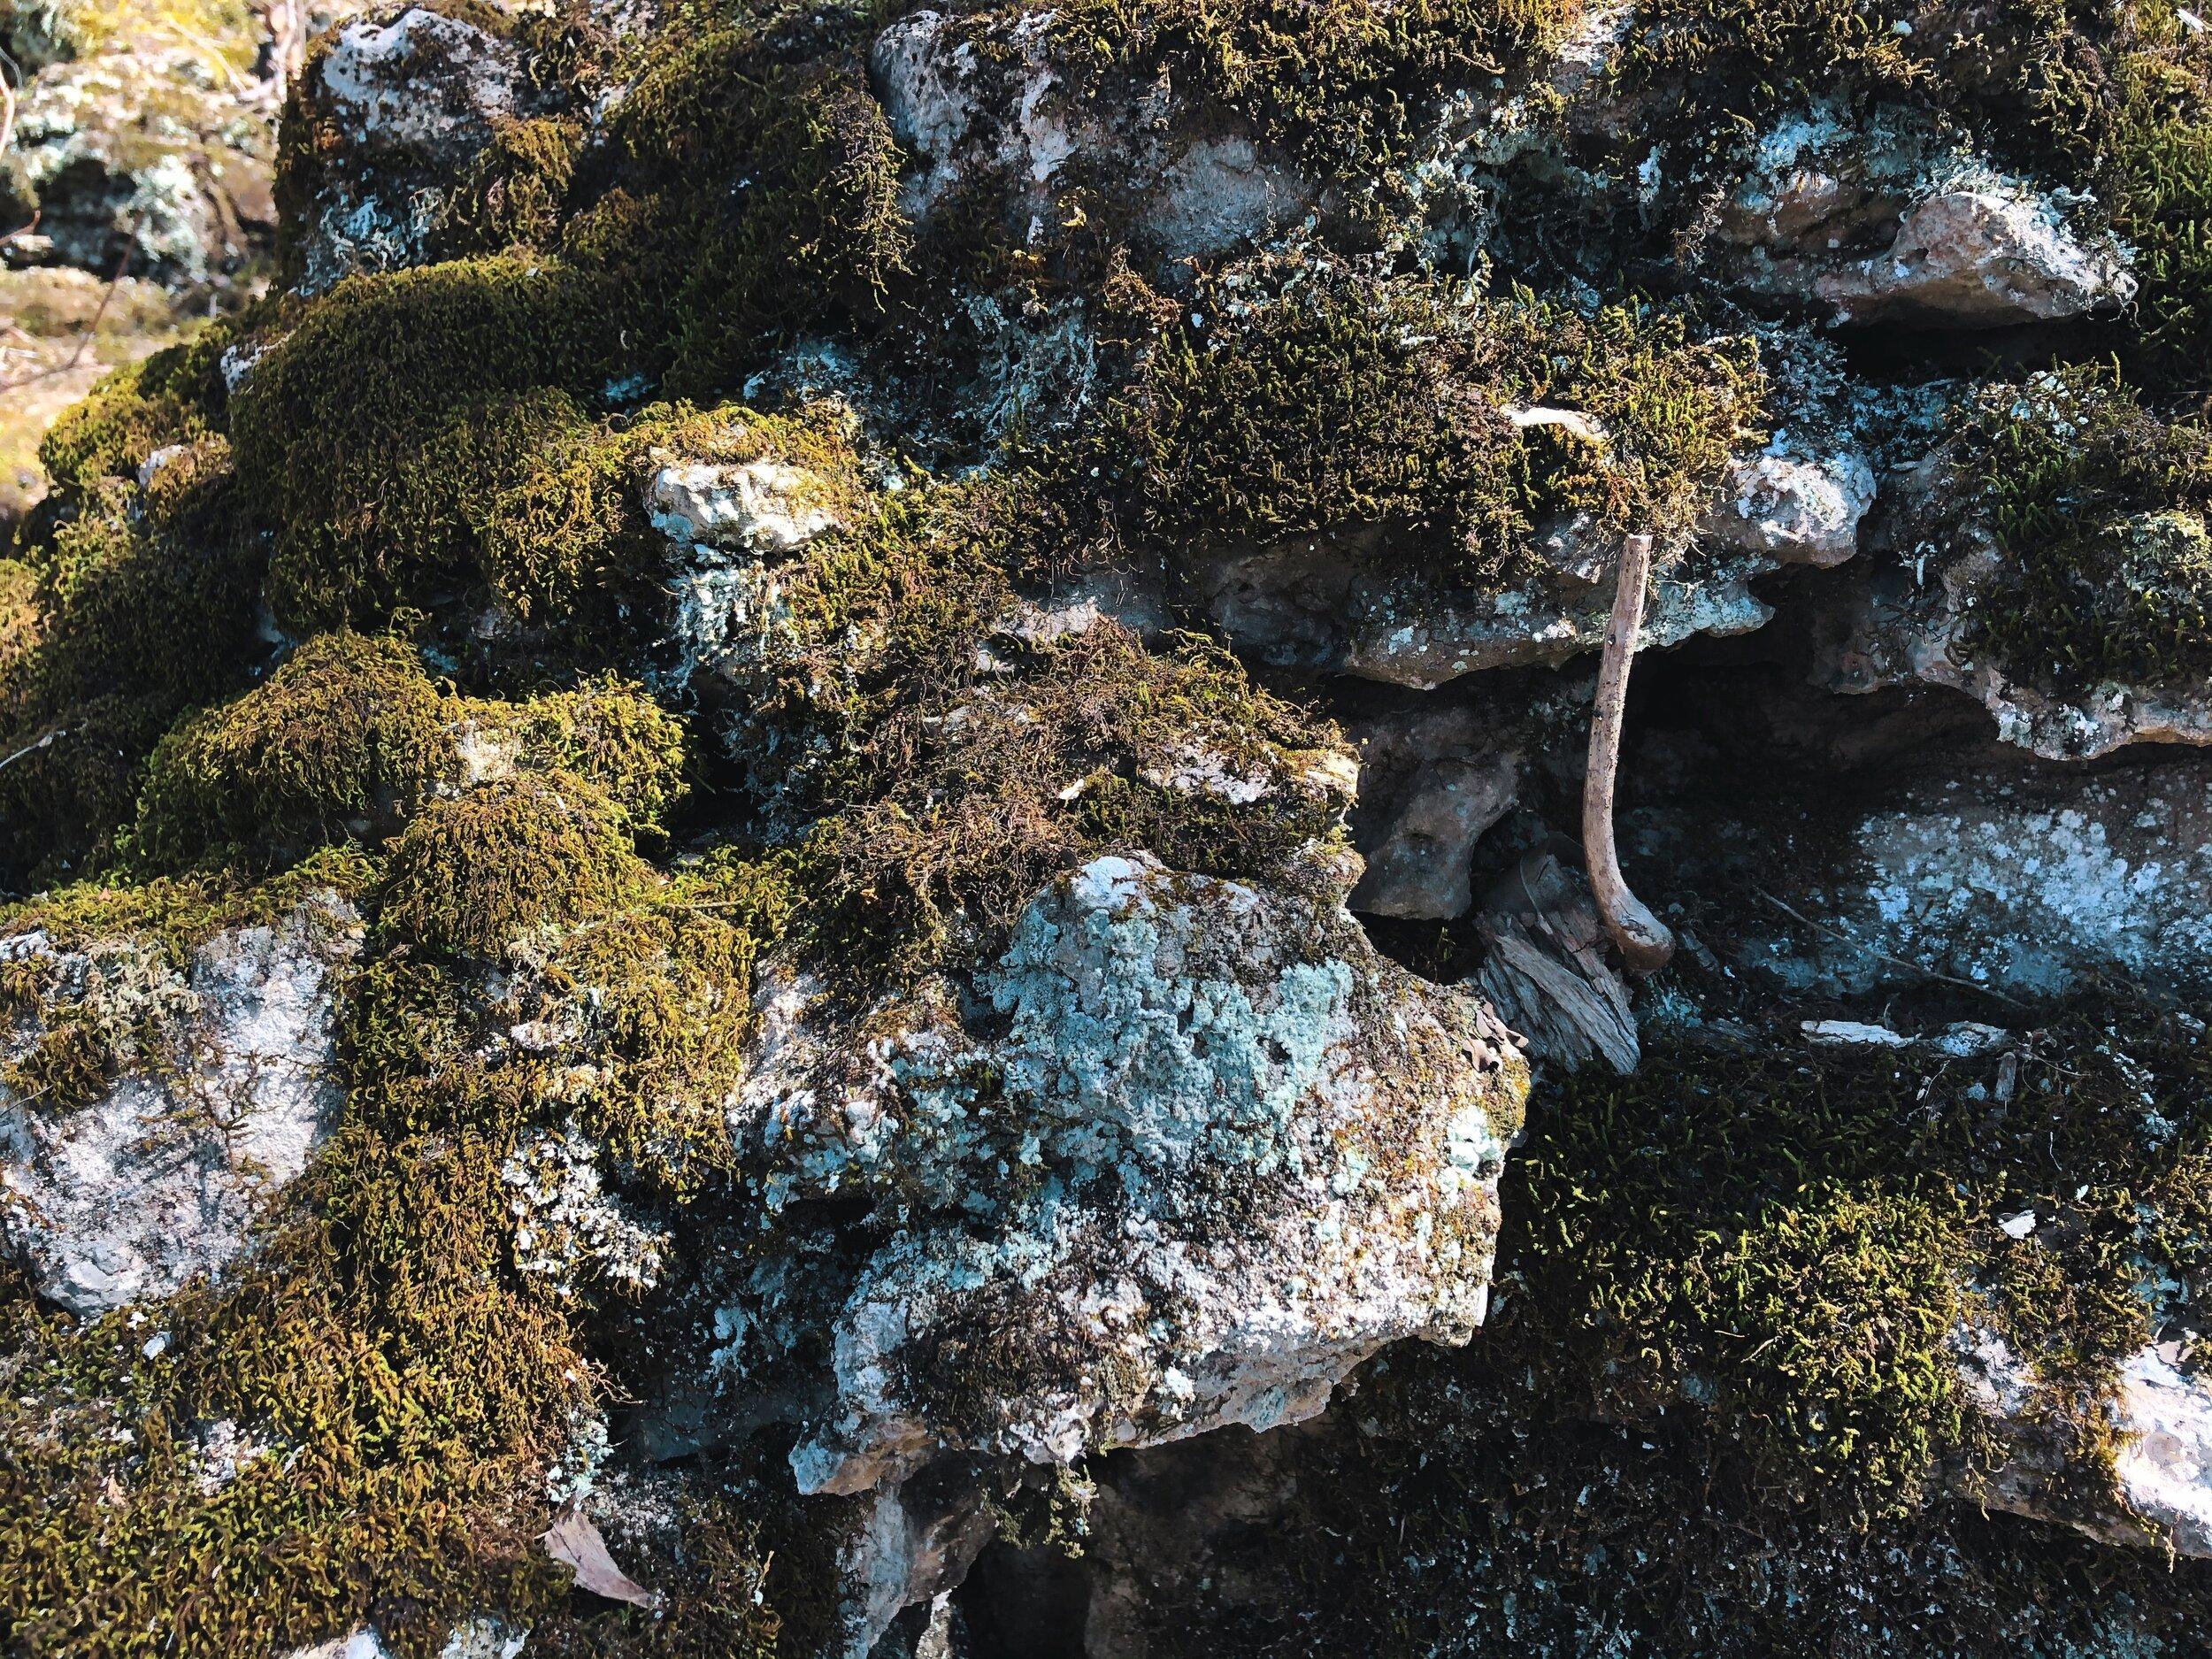 rockswoods-reservation-wildwood-missouri0538.JPG